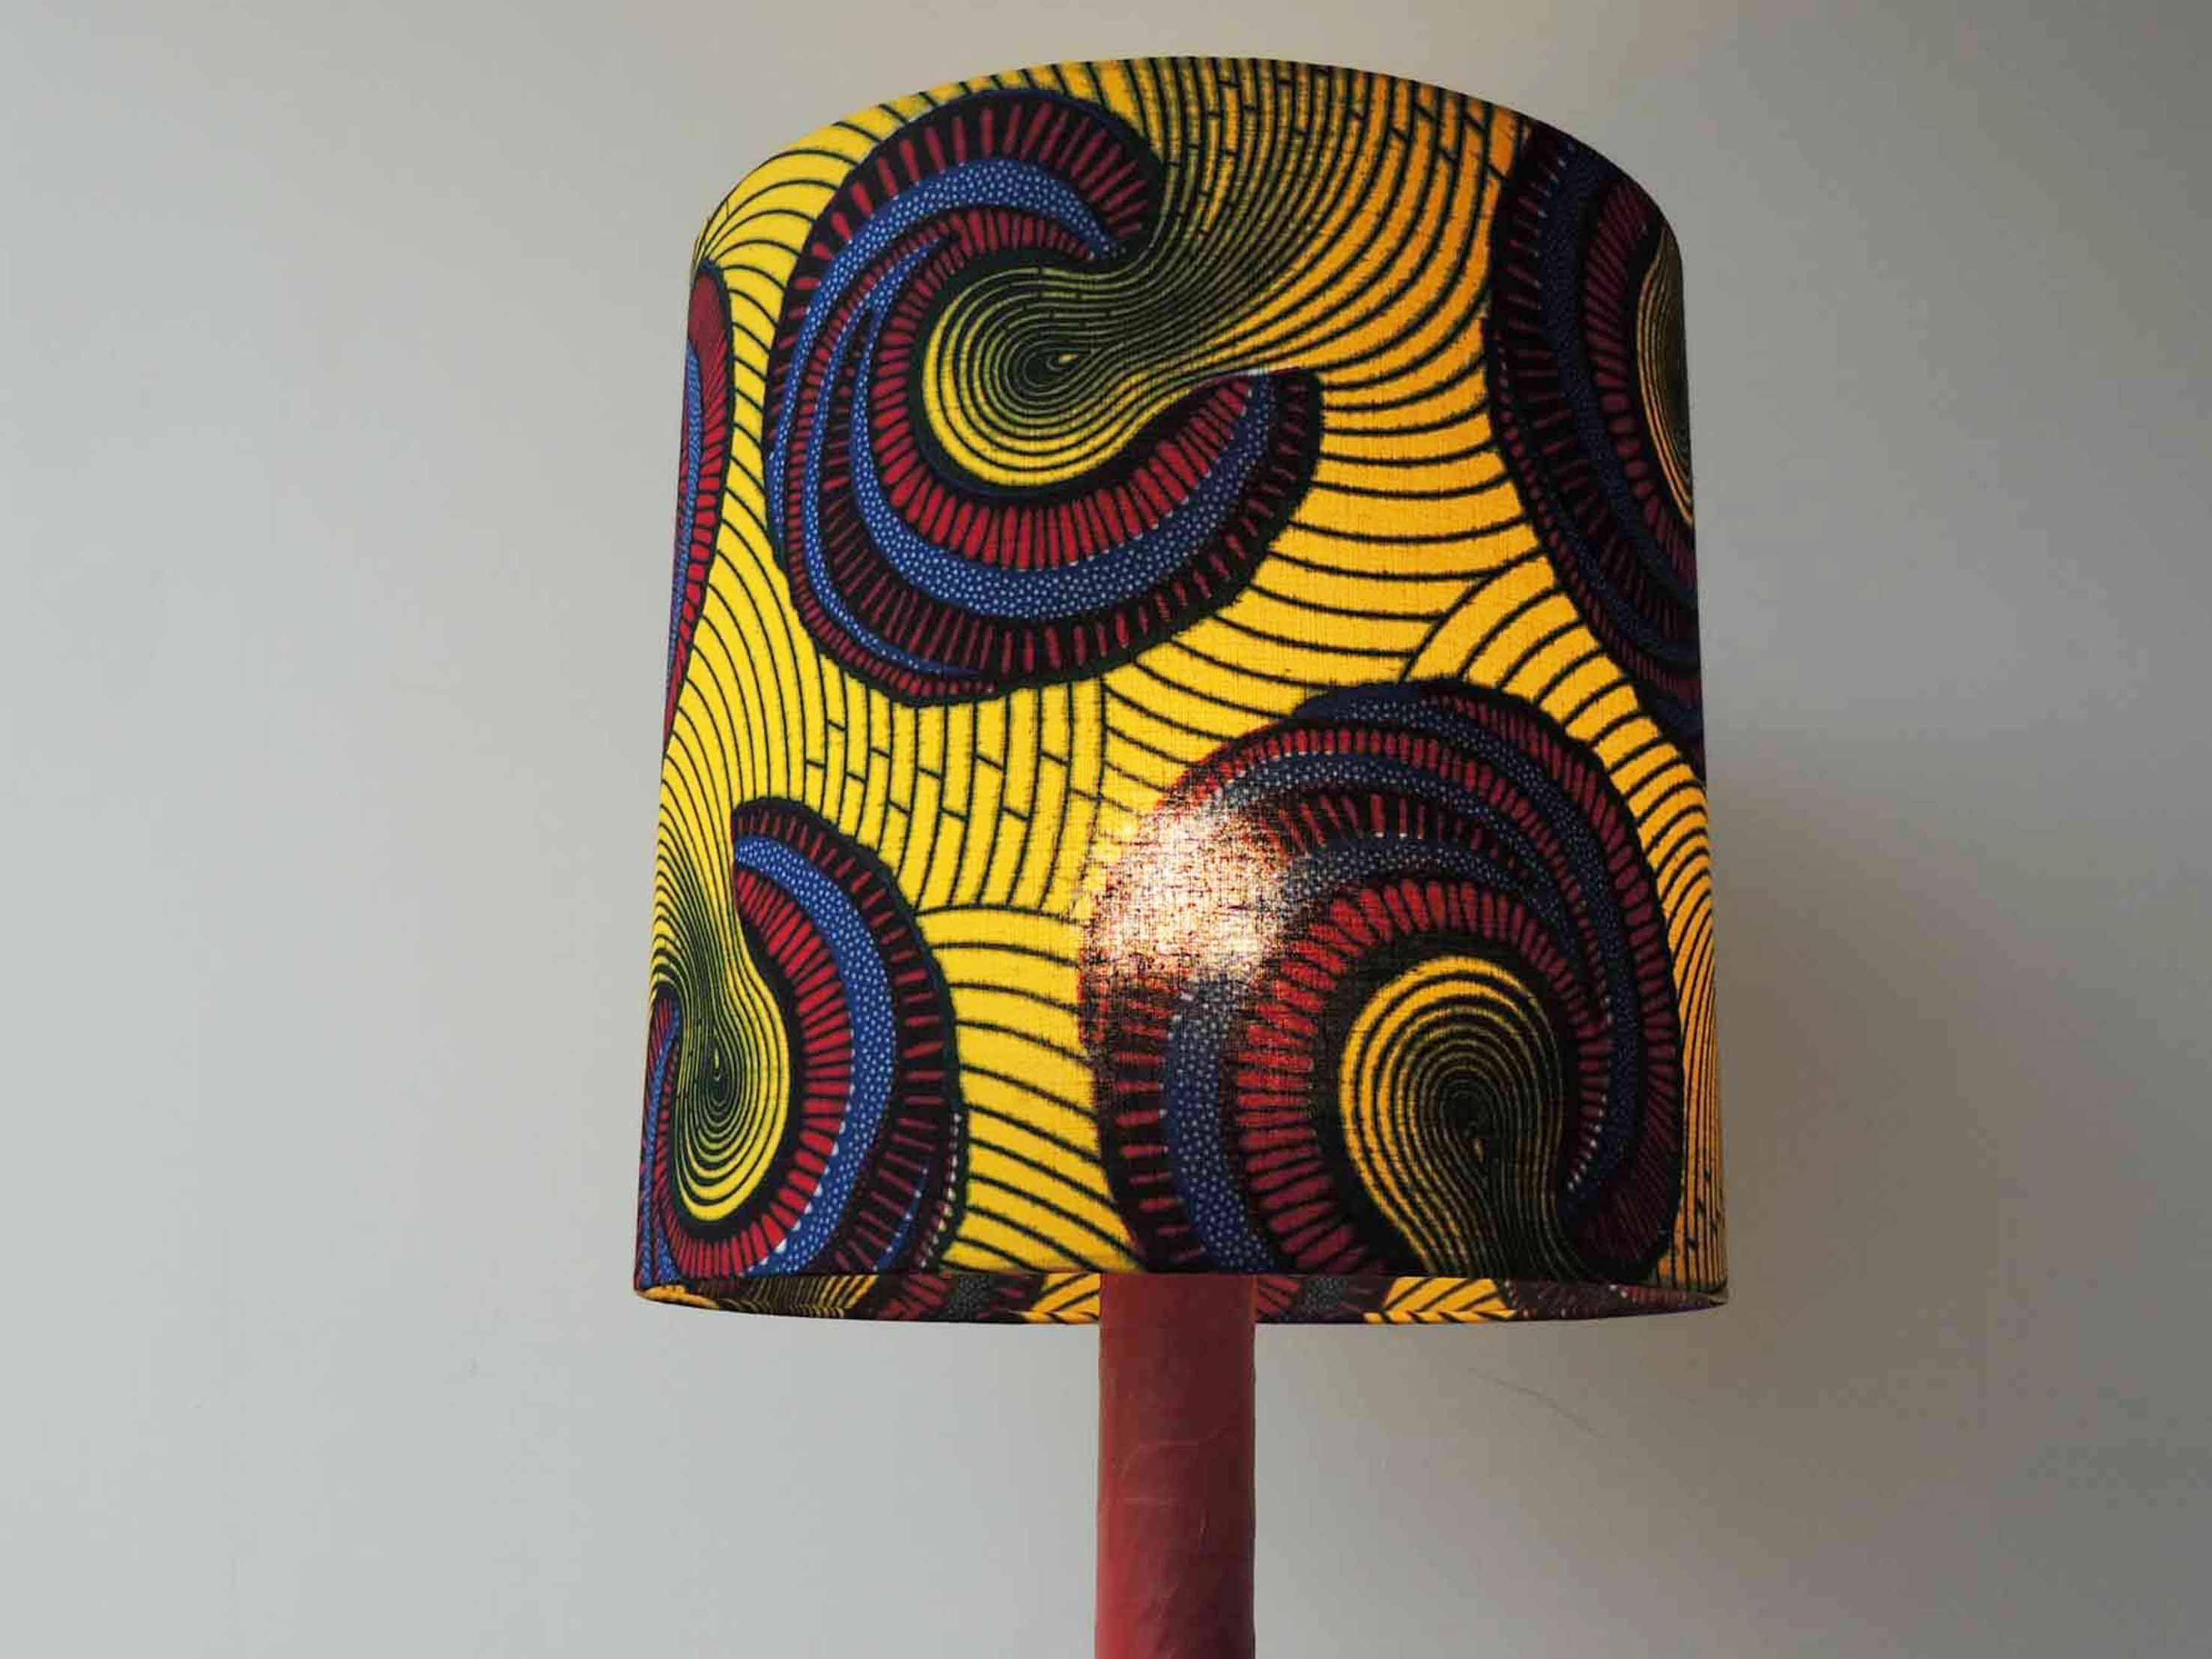 Tissu AfricainHouse En Jour Décoration Abat Intérieure Stuff MqSpzGVU